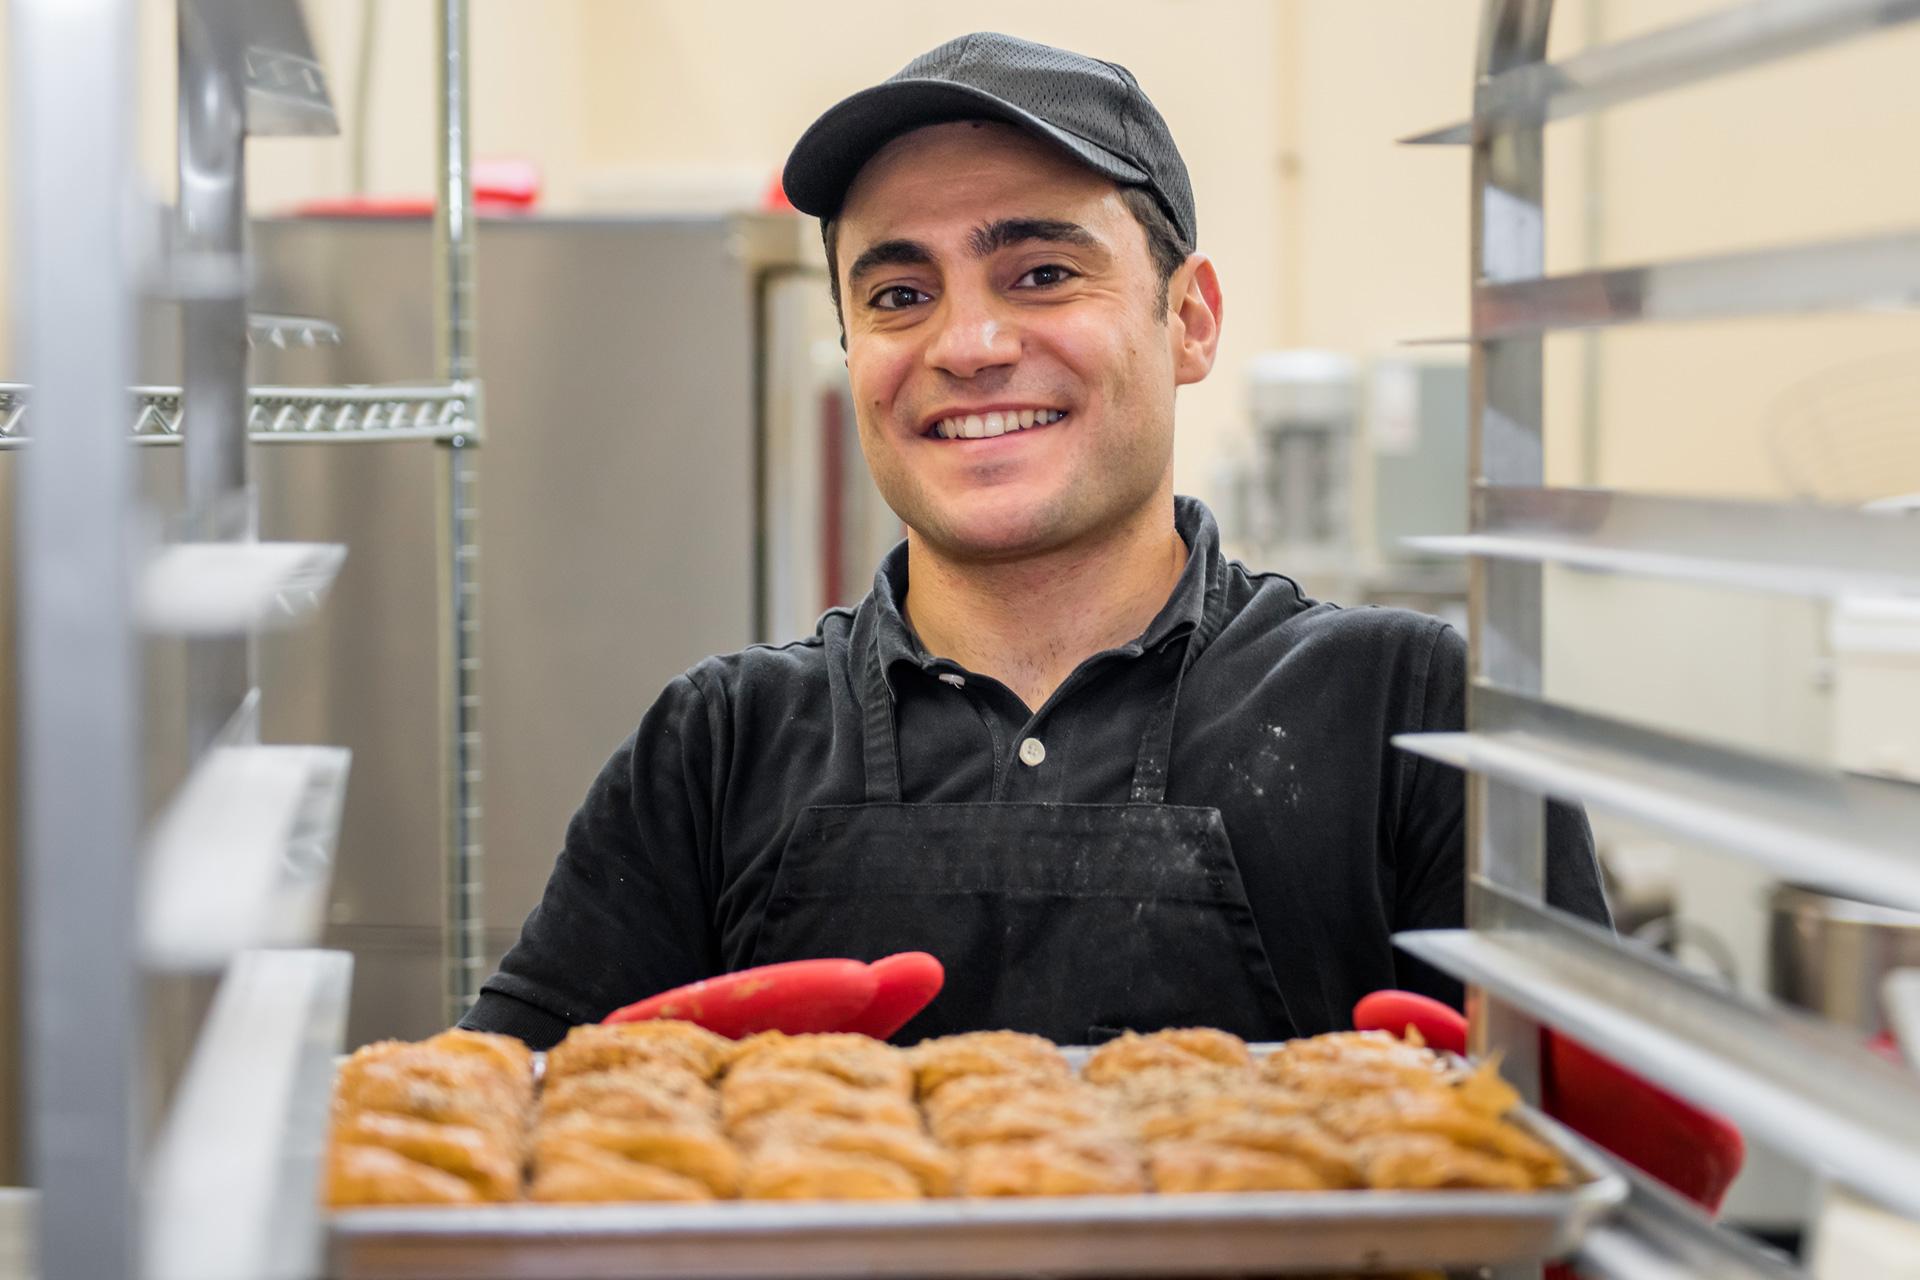 Smiling man loads a tray of baklava